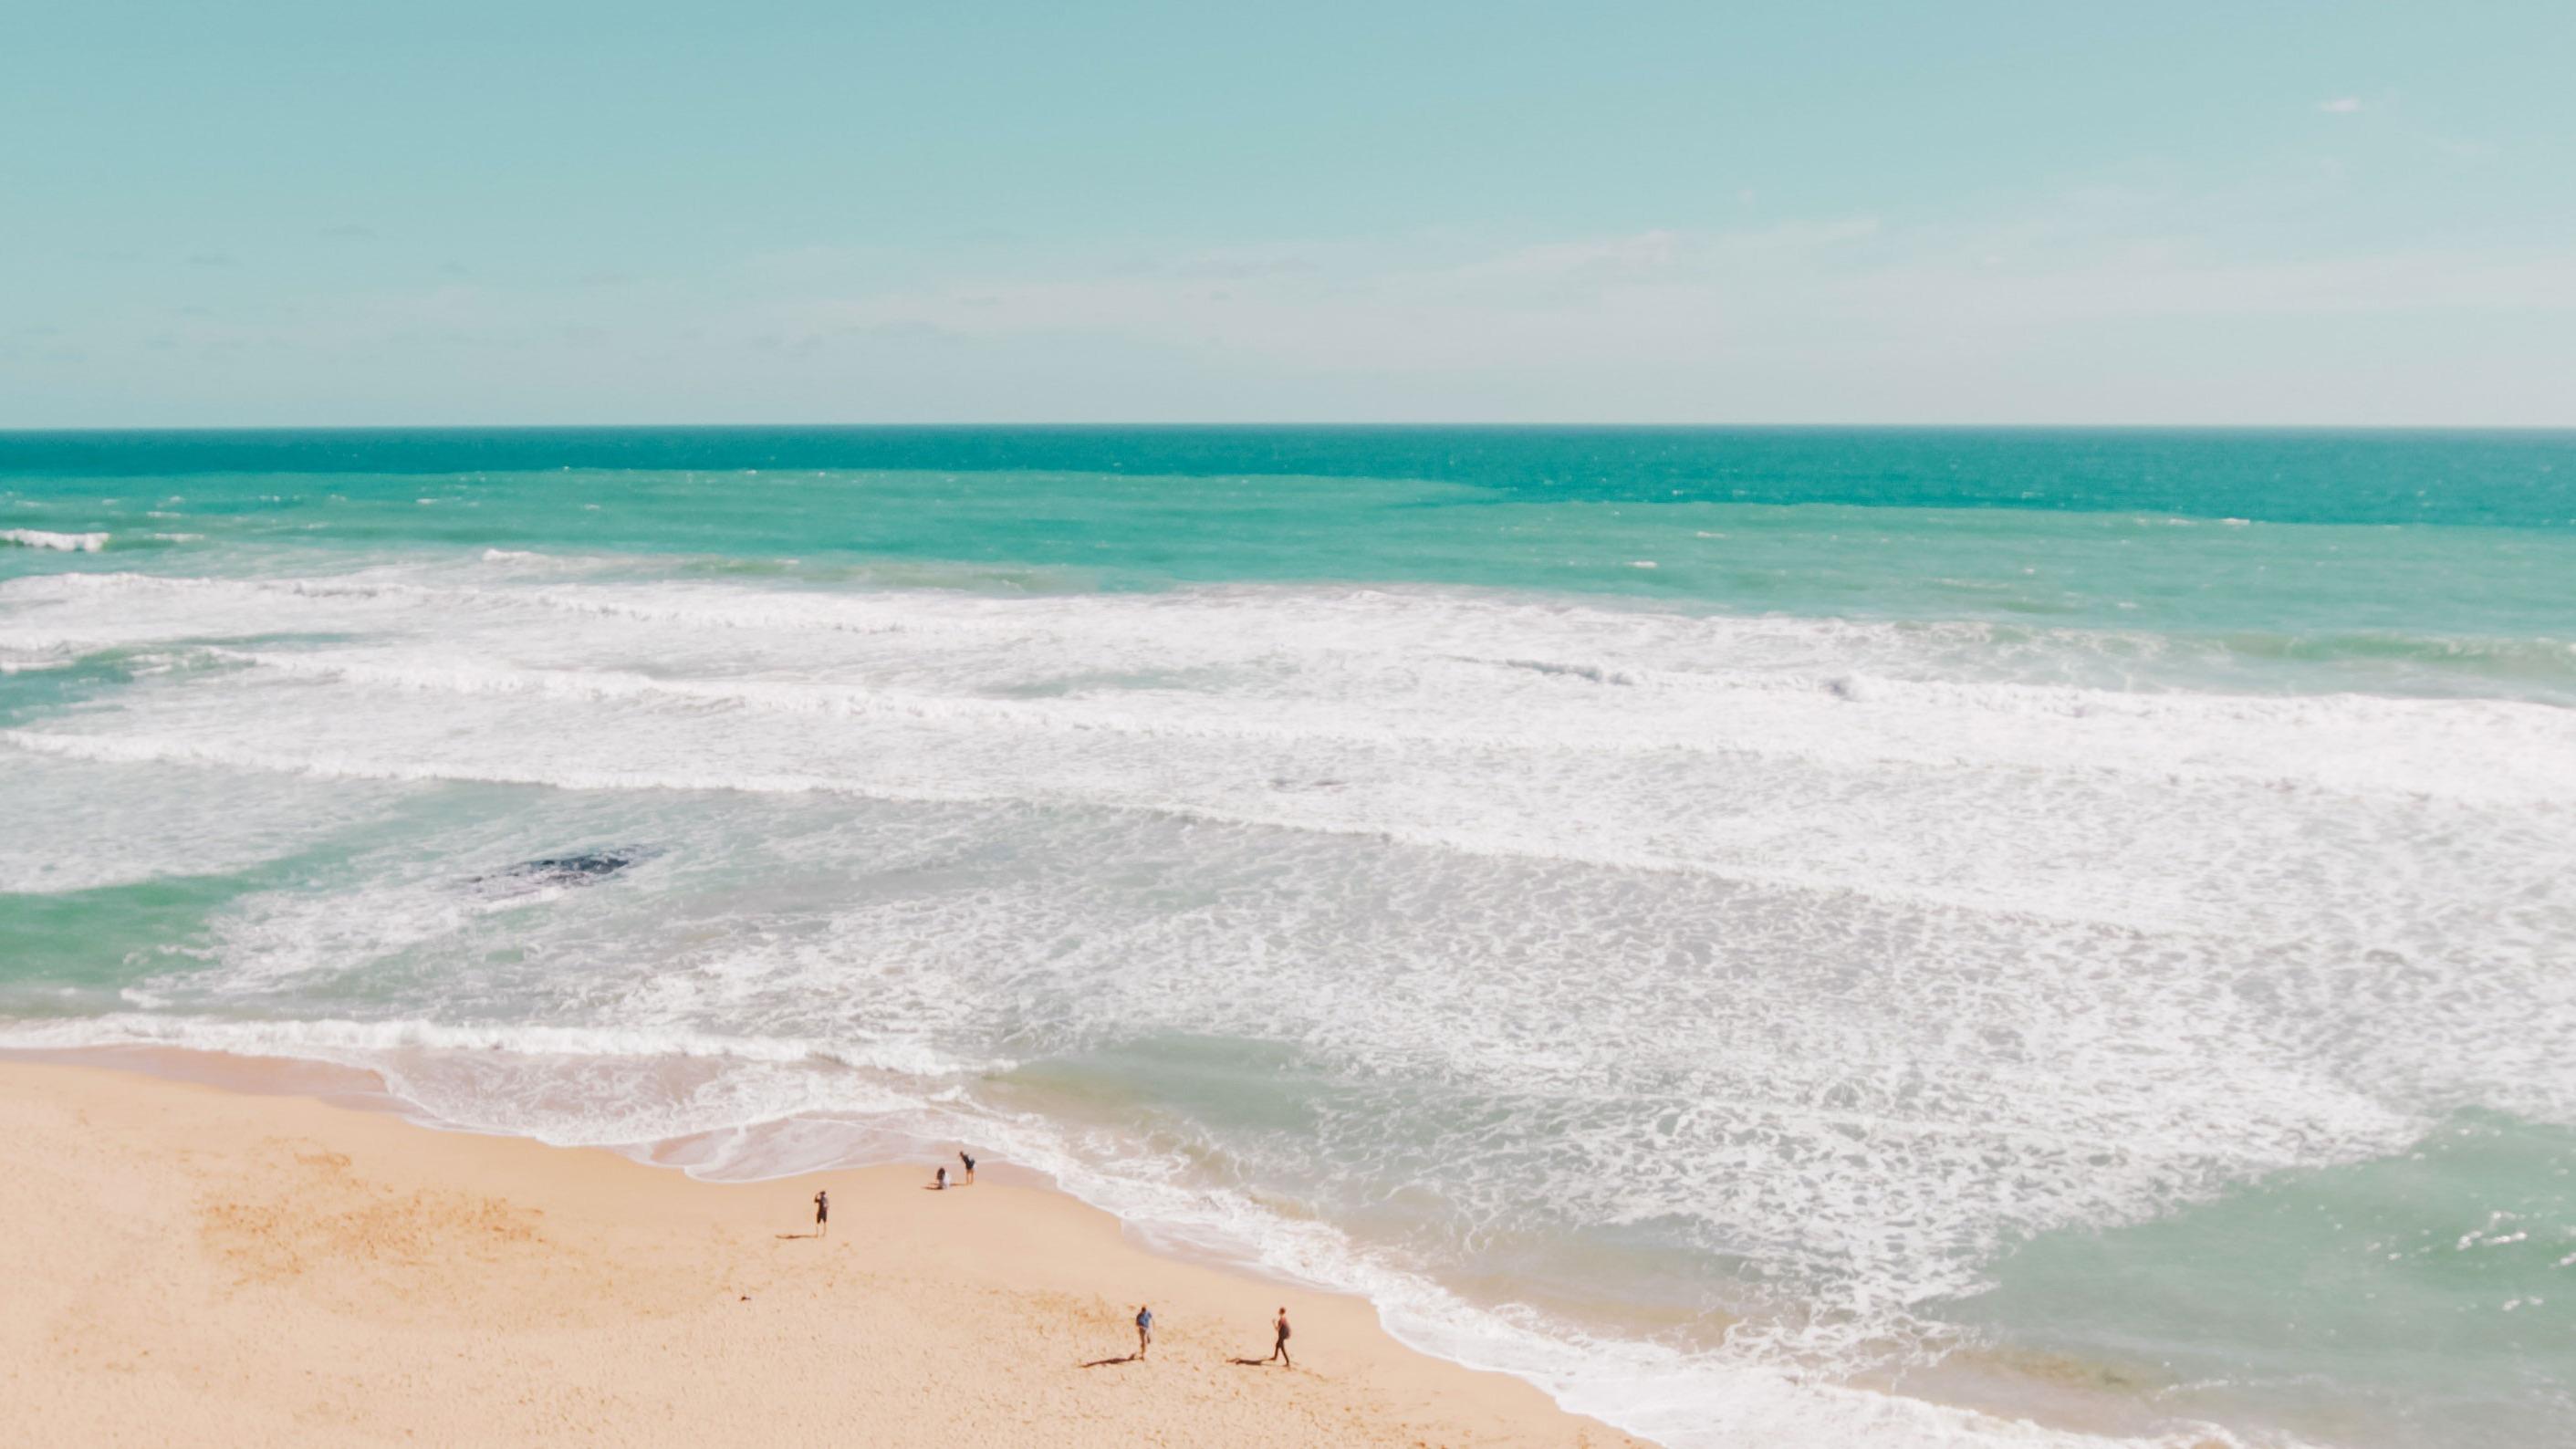 Check list vacances mer, valise location mer | Abritel